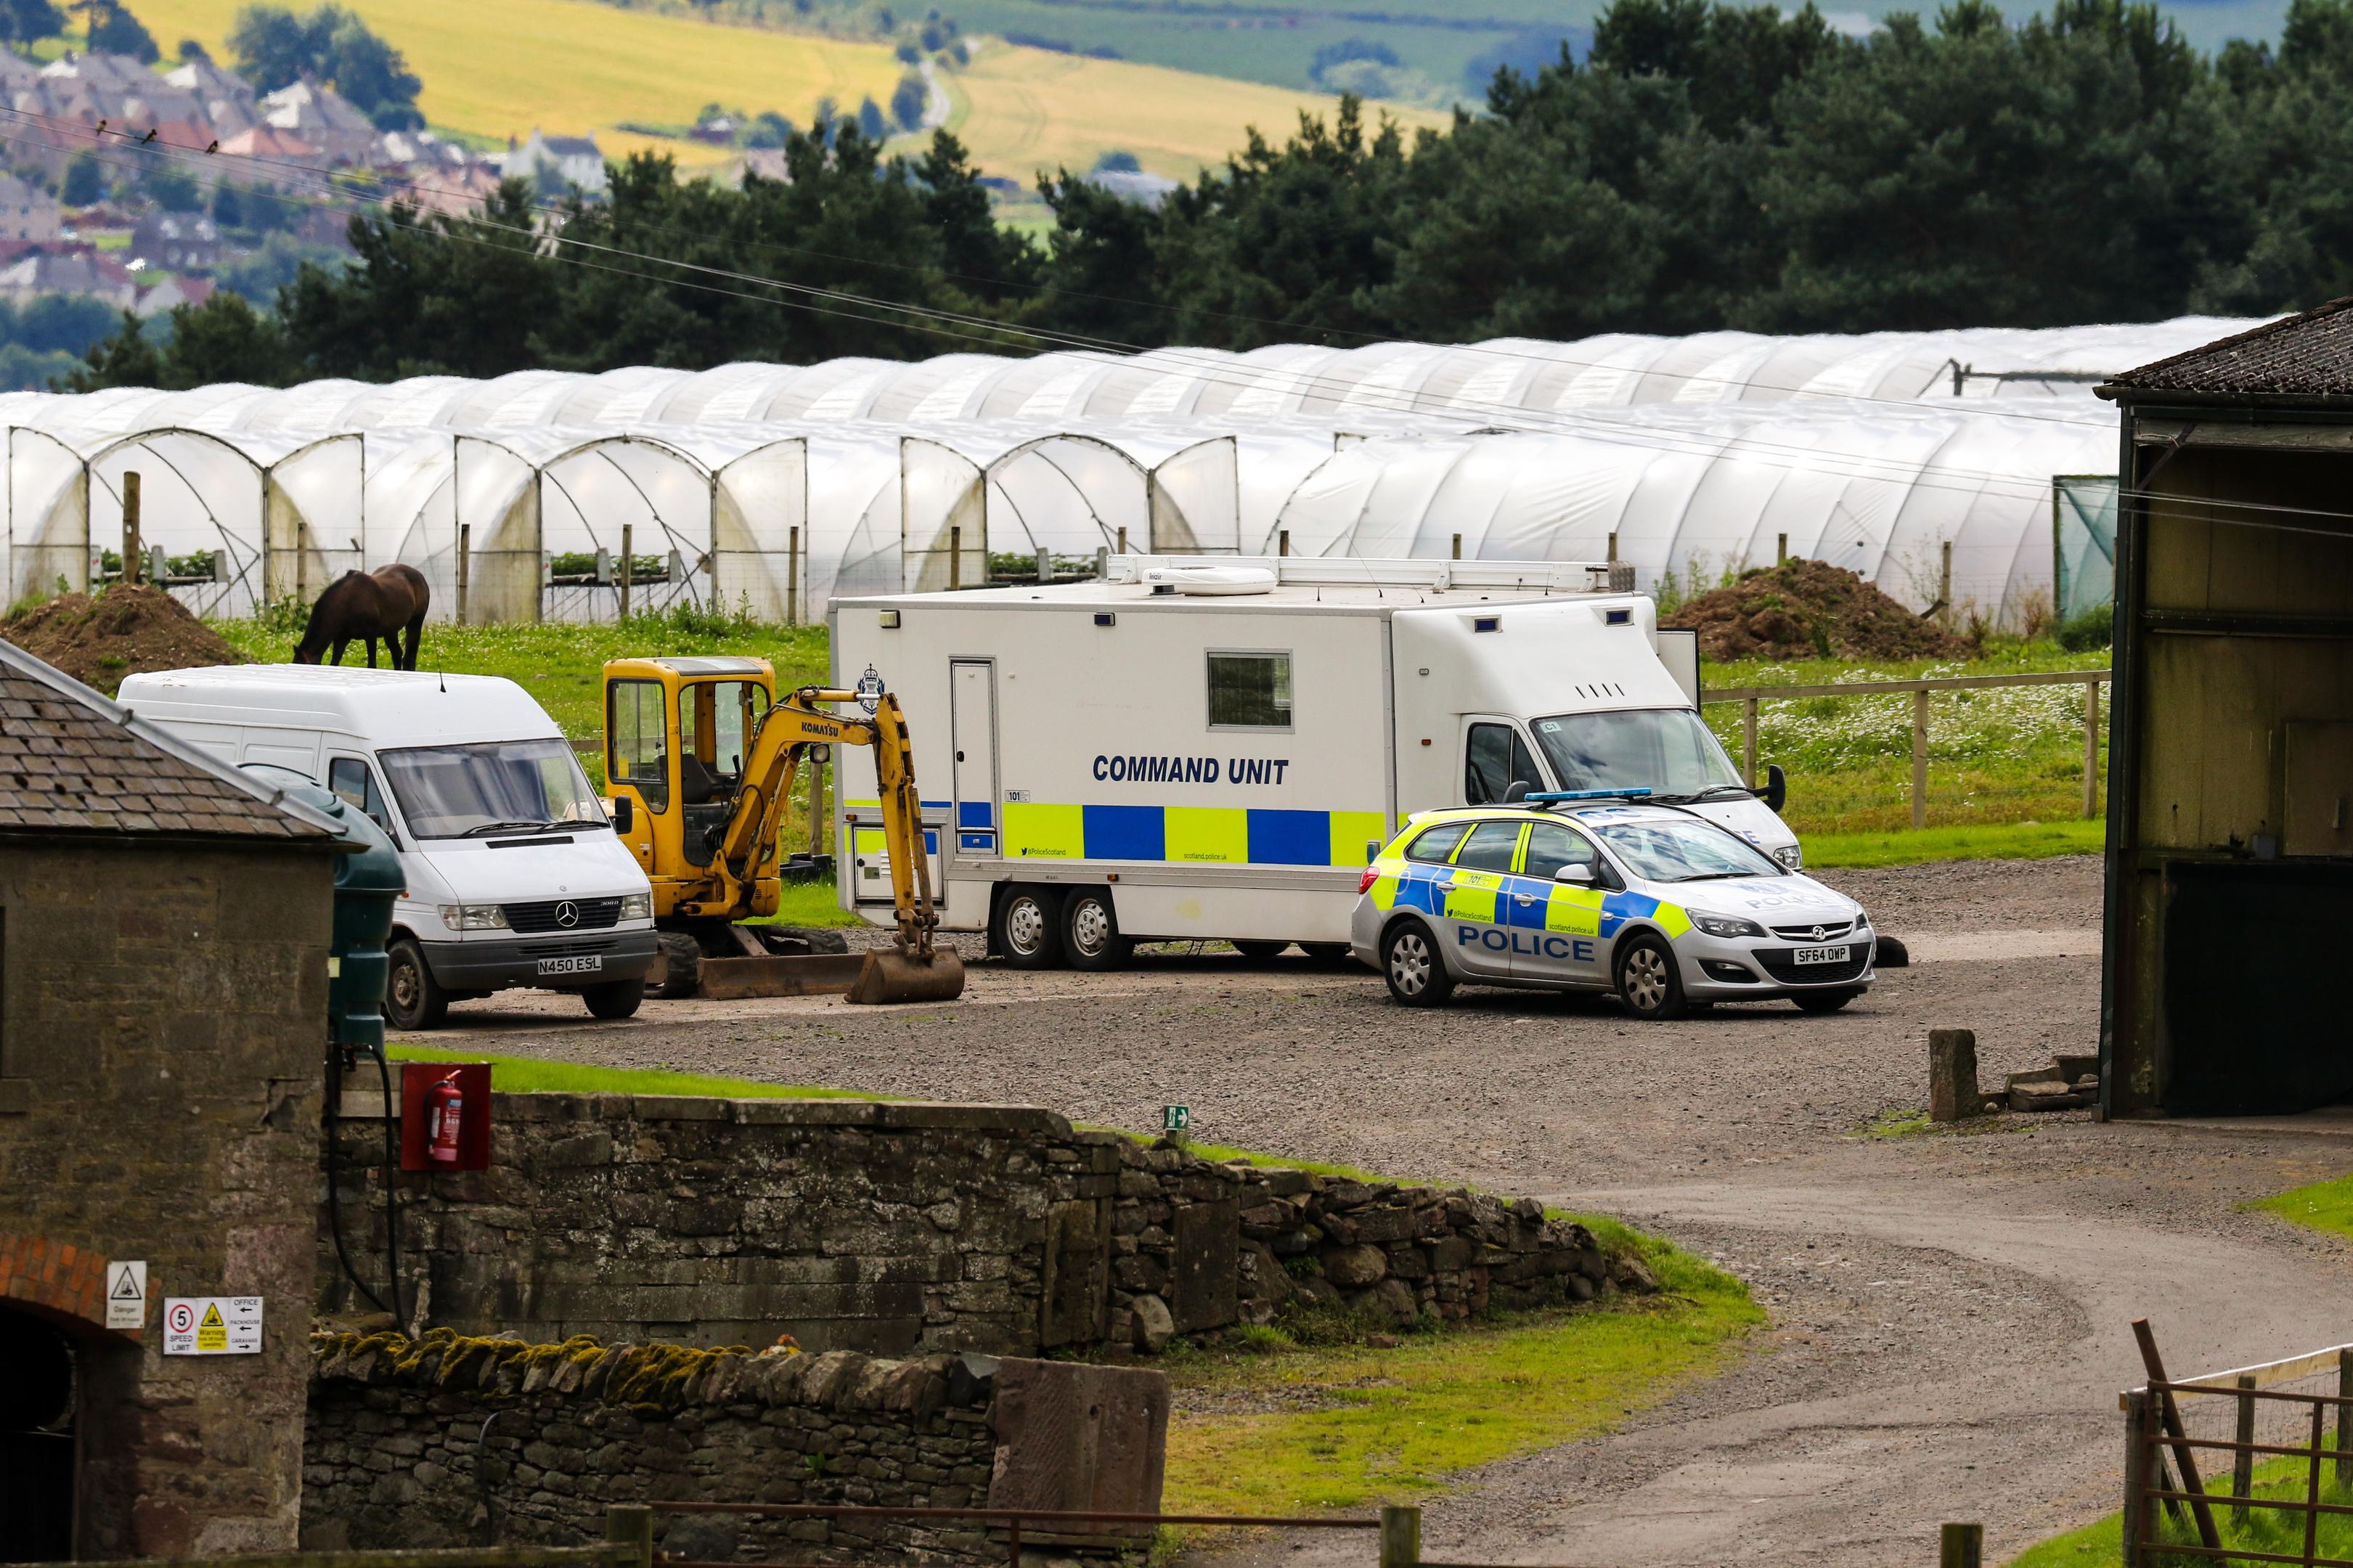 Police vehicles at the scene at Mains of Errol Farm, Errol, on Monday.